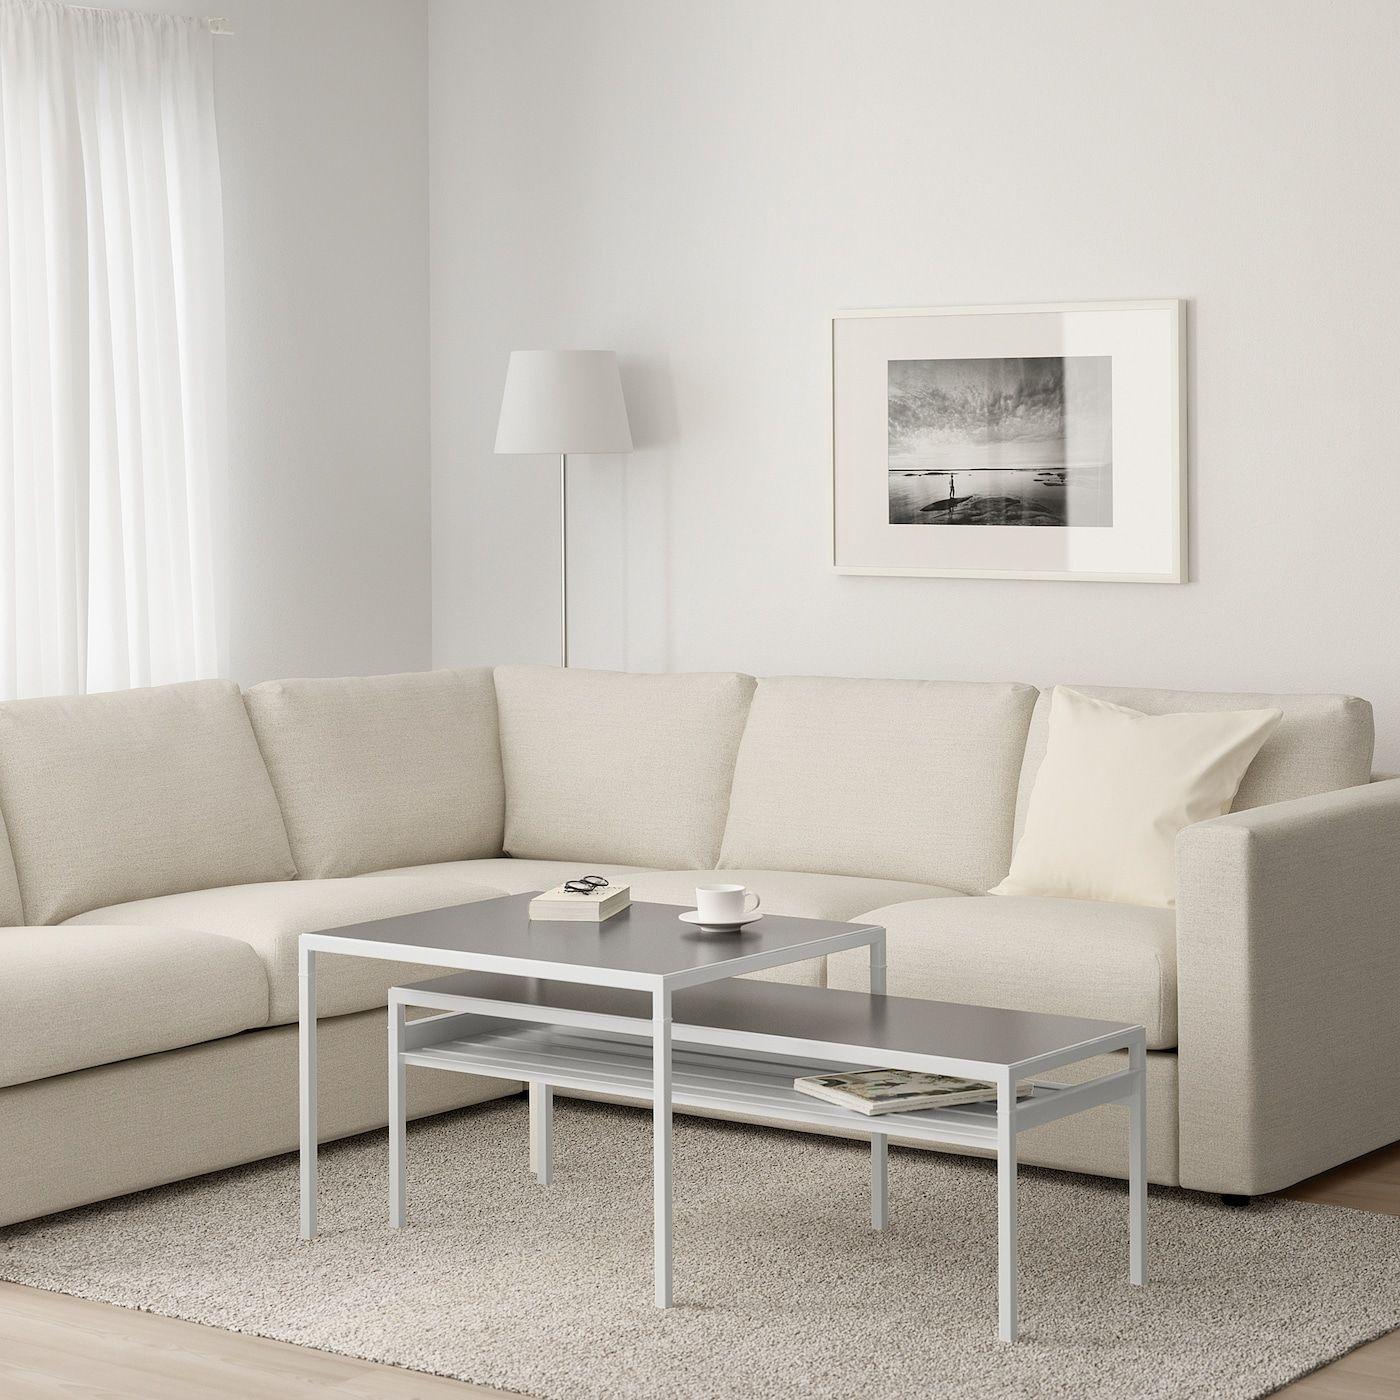 Nyboda Coffee Table W Reversible Table Top White Gray Ikea Coffee Table Calm Living Room Ikea Lack Coffee Table [ 1000 x 1000 Pixel ]